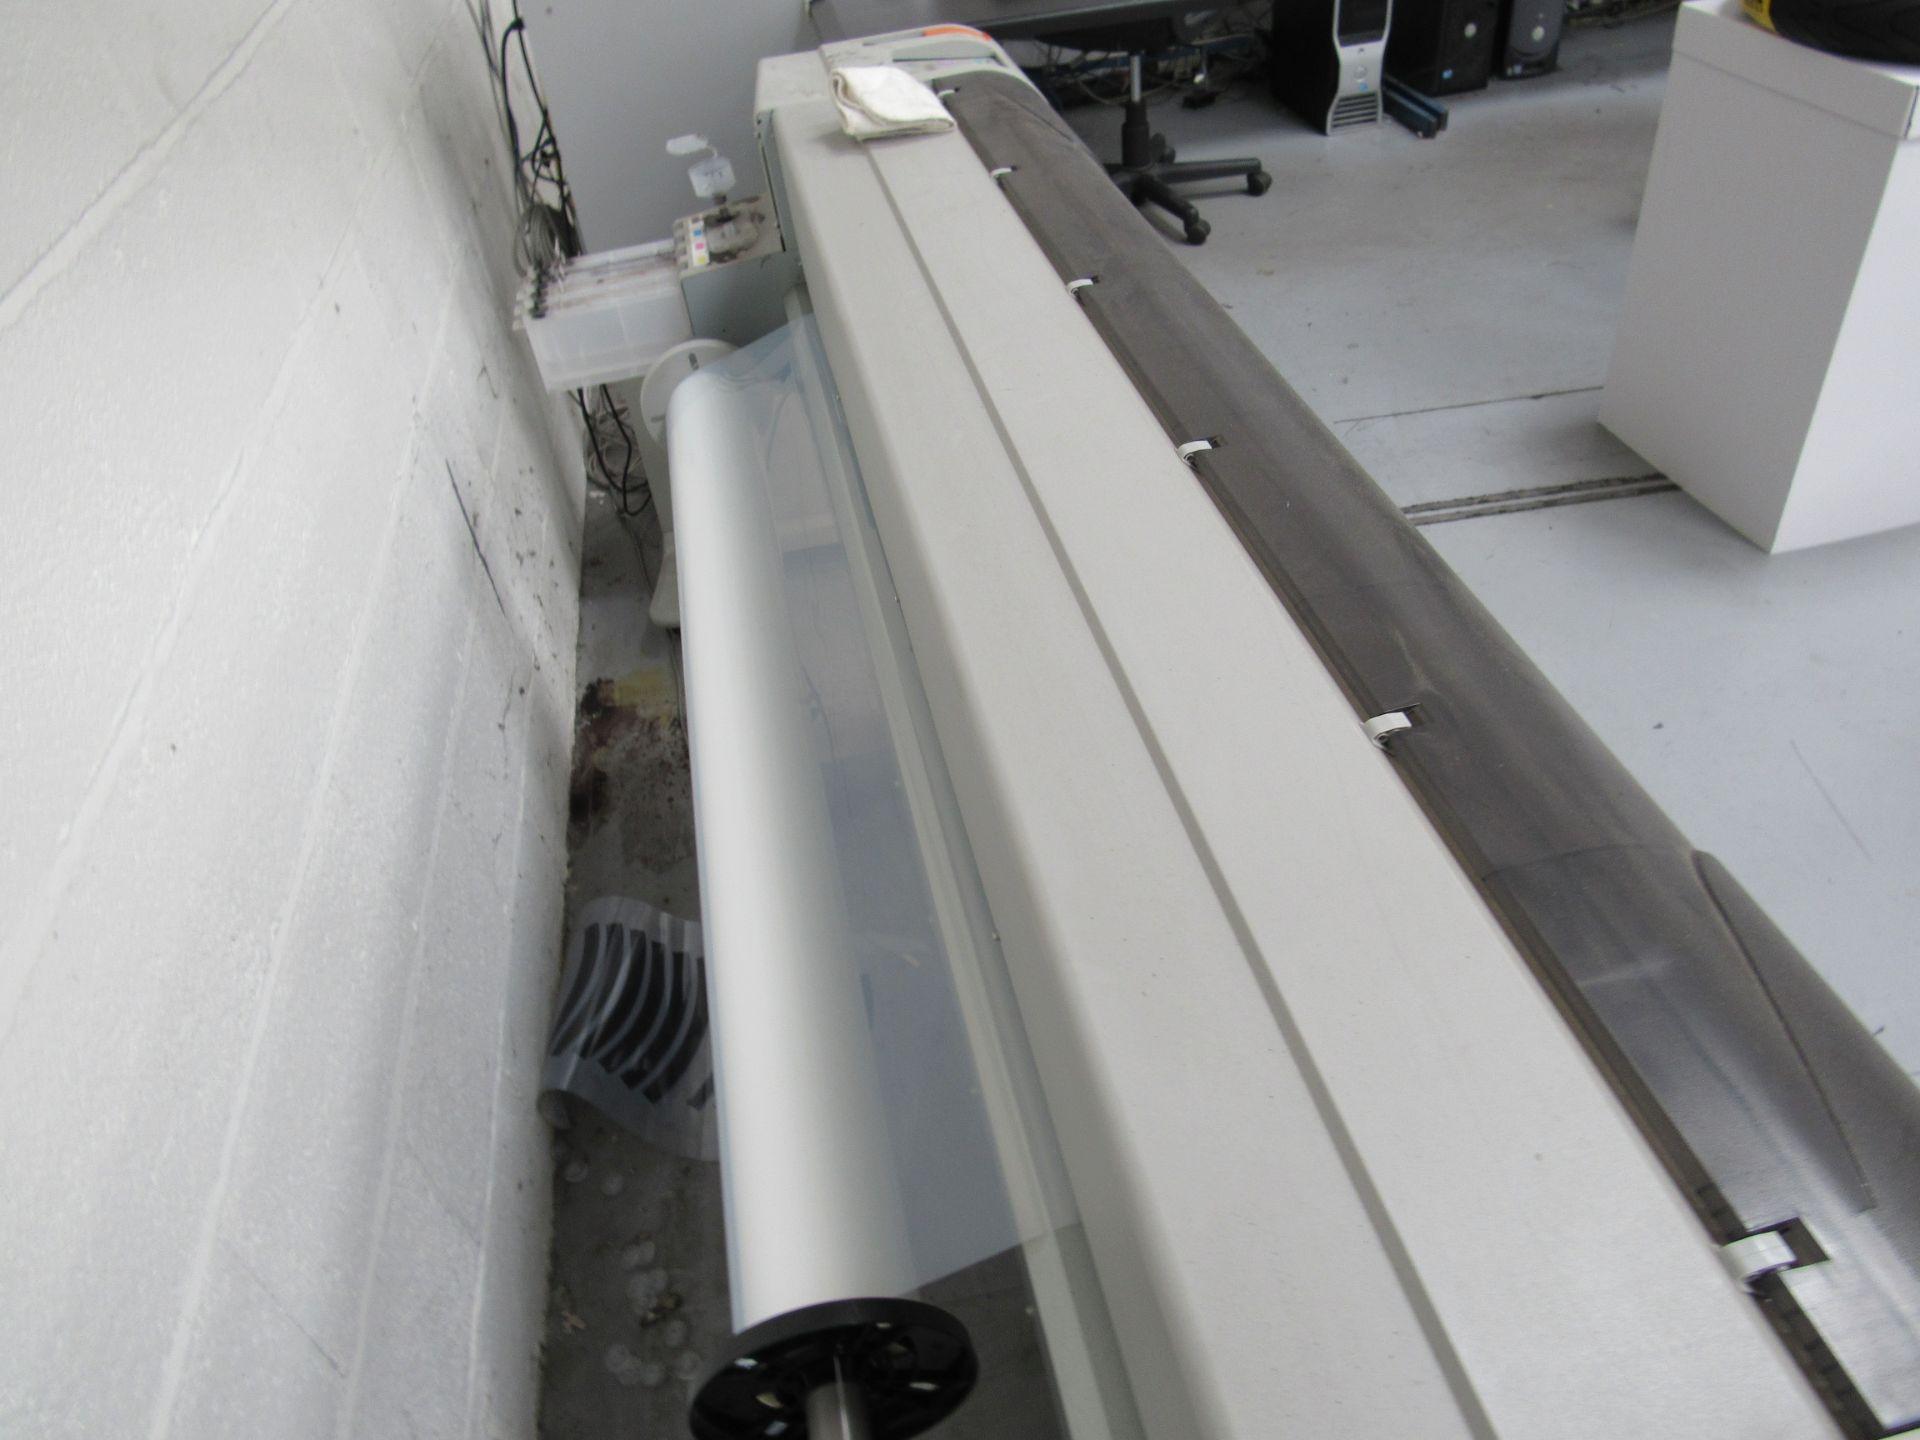 Mlitoh RJ-900C Wide Format Printer 1150mm Serial Number FN4E004886 - Image 4 of 5